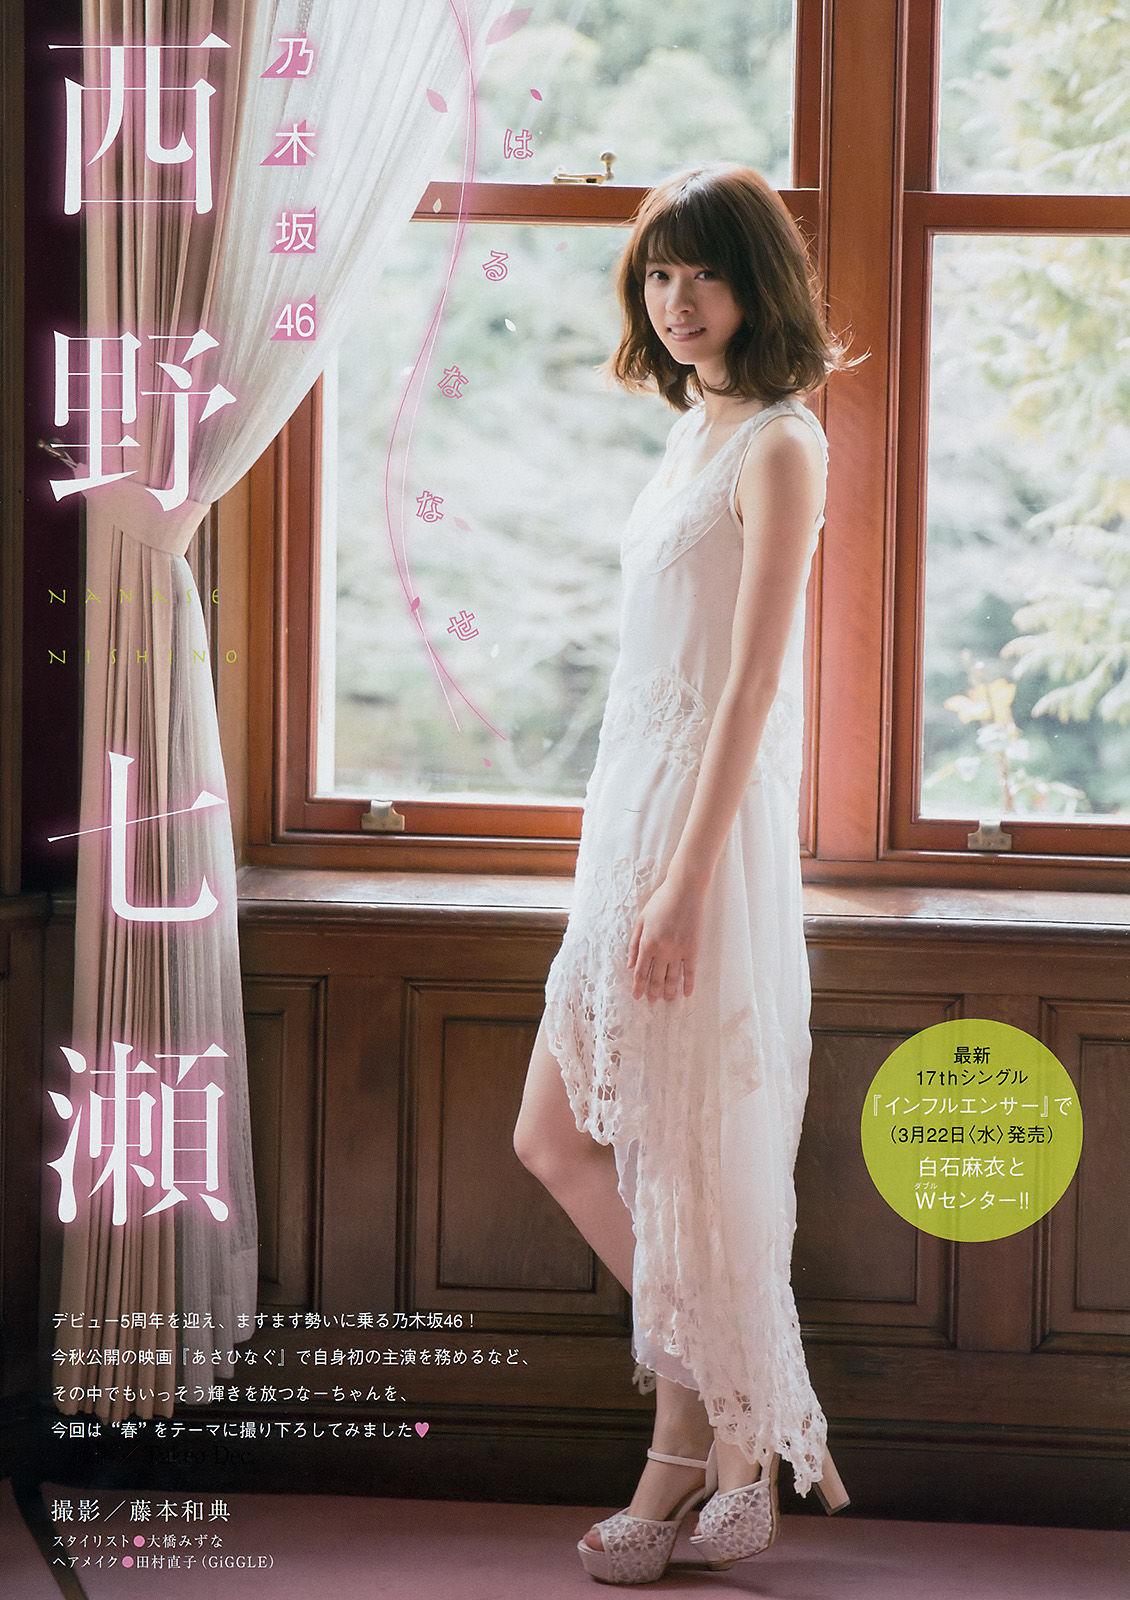 VOL.134 [Young Magazine]甜美:西野七濑超高清写真套图(12P)